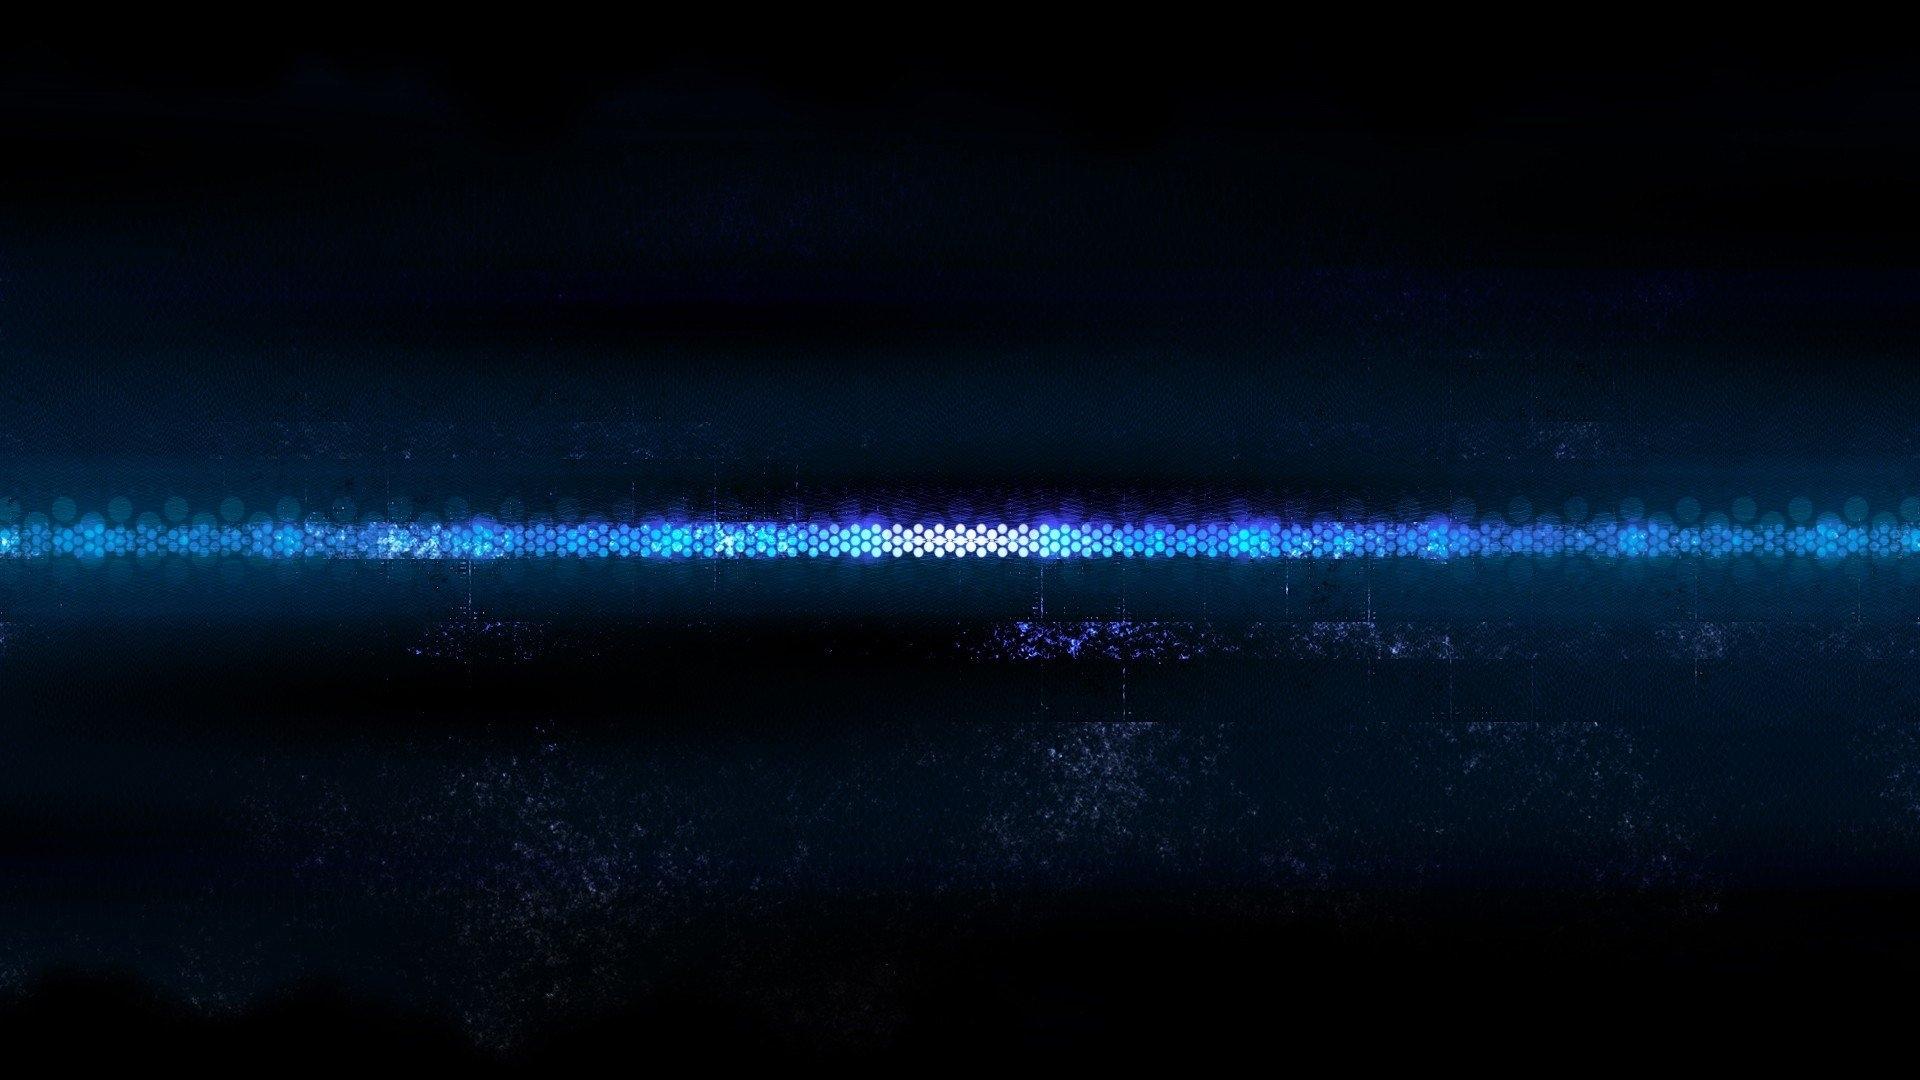 10 Most Popular Best Dark Desktop Backgrounds Full Hd 1920 1080 For